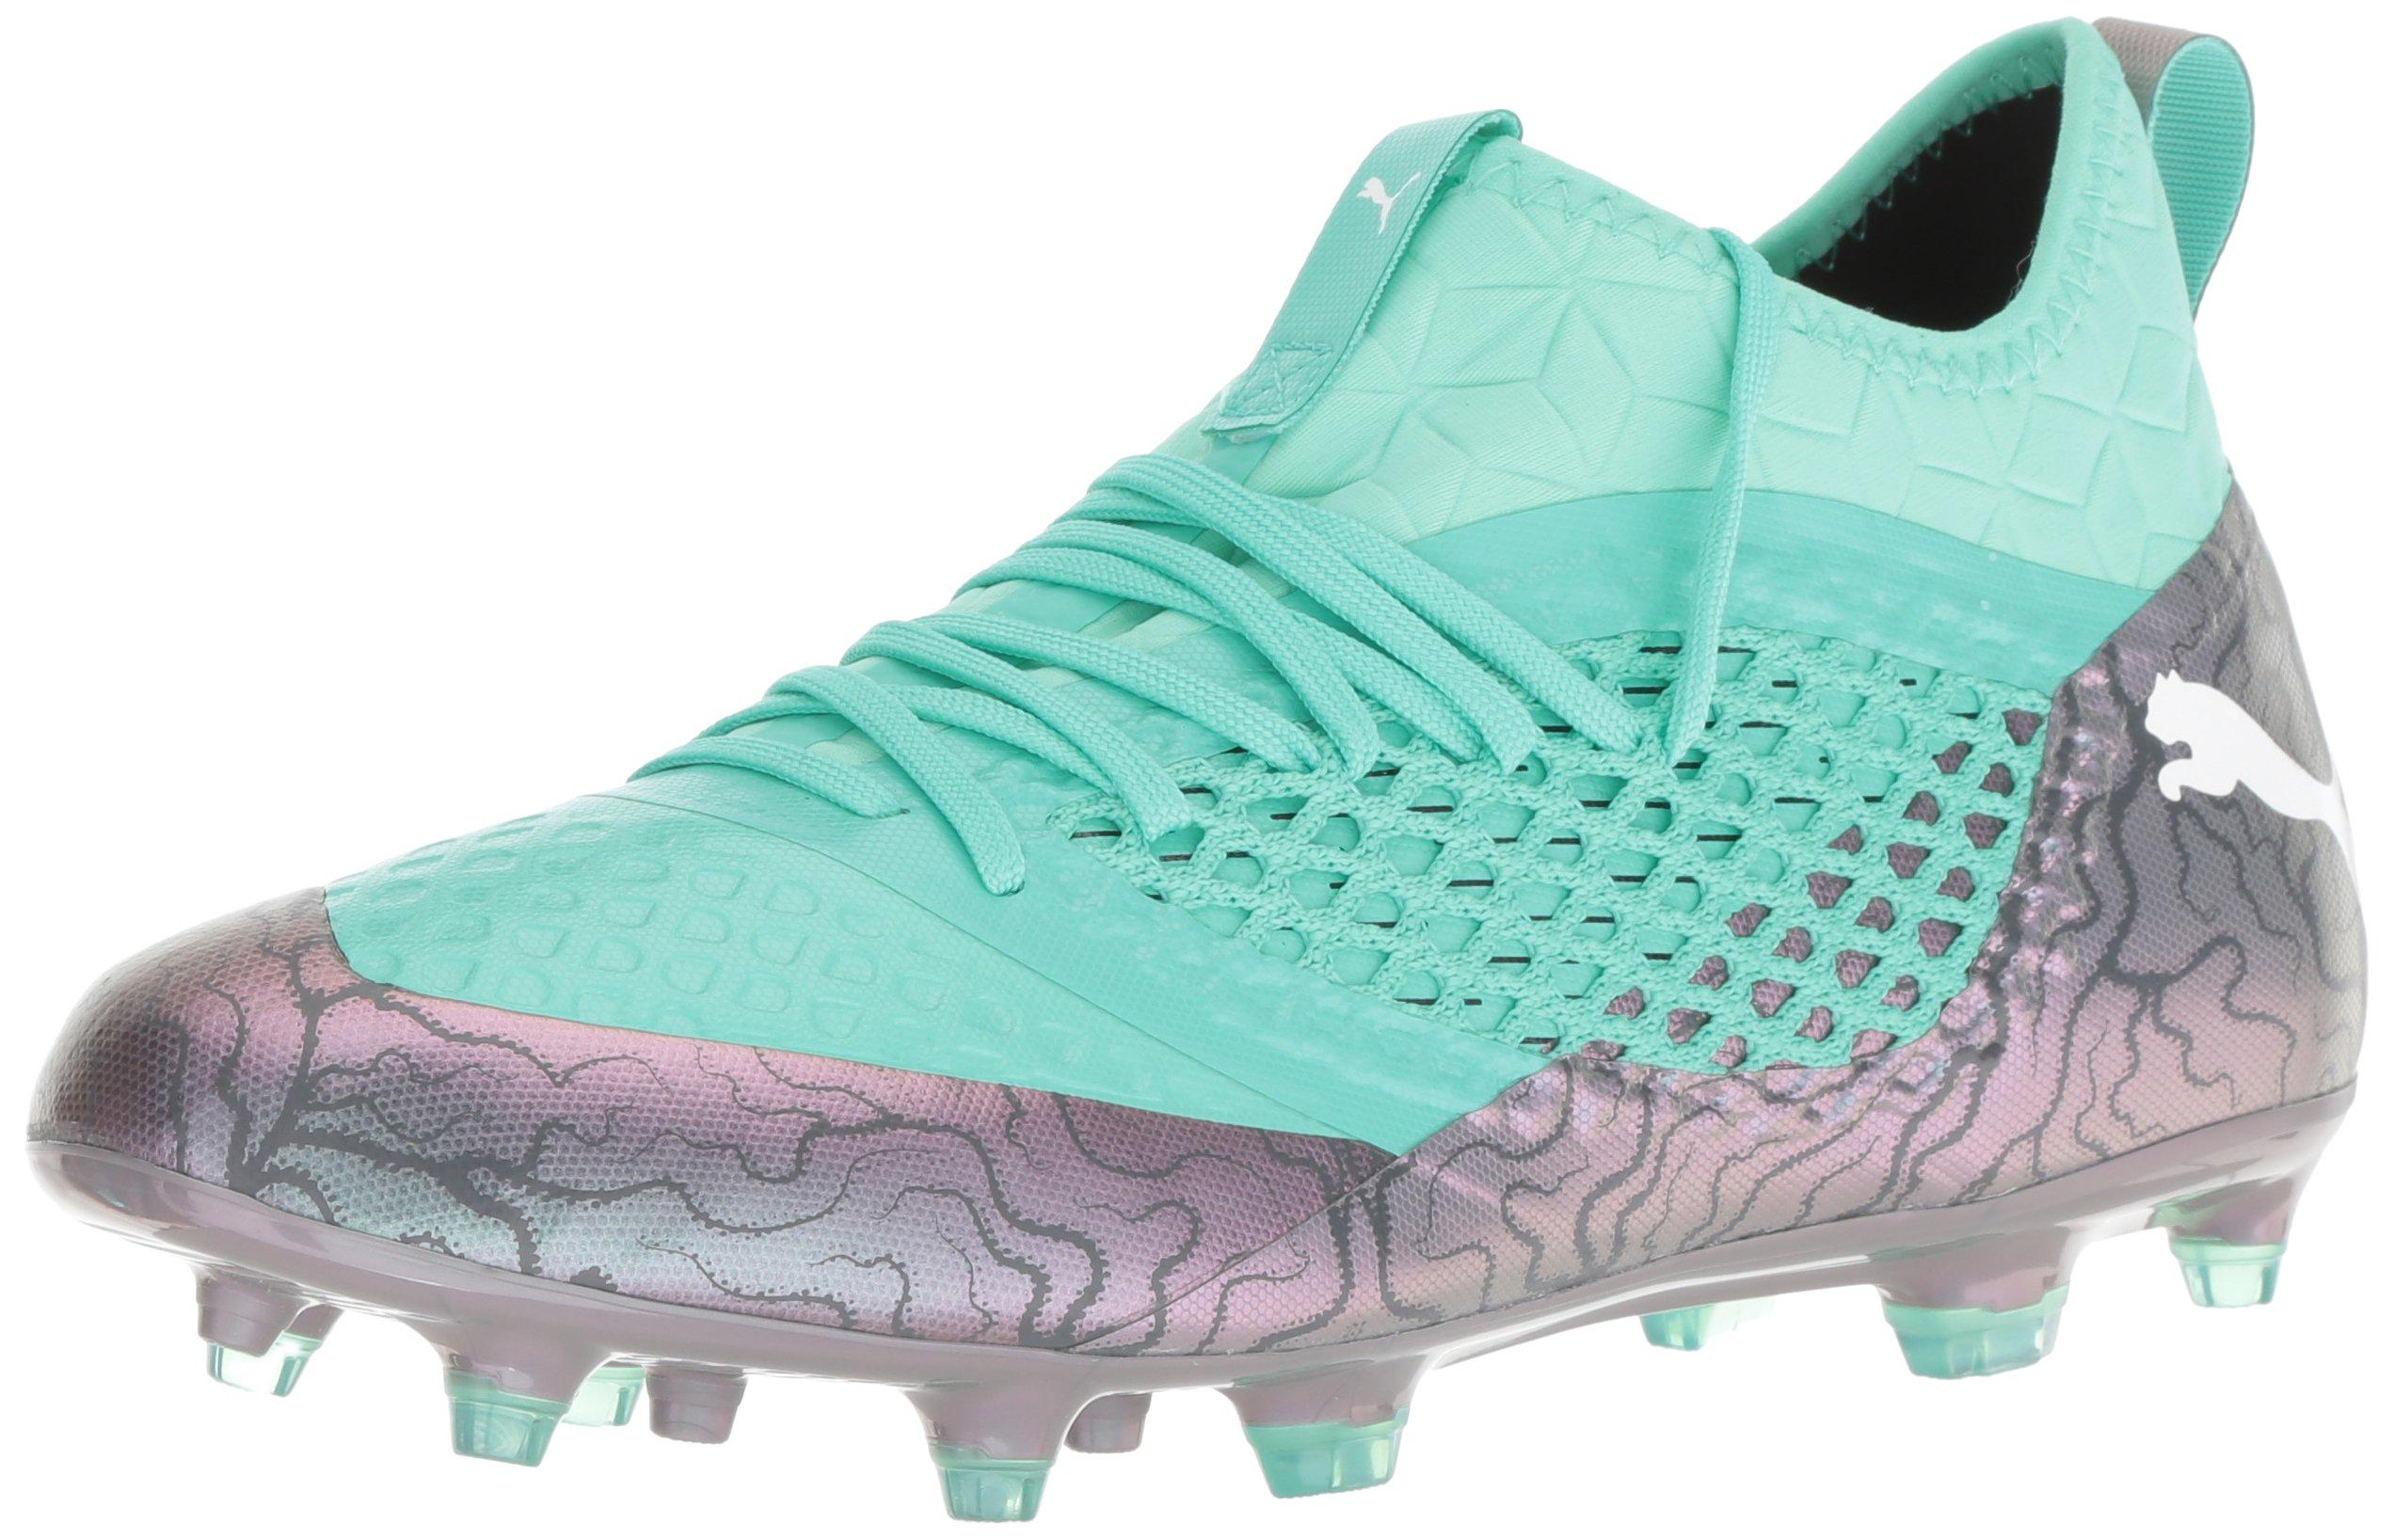 43fb3c6a0e32 Galleon - PUMA Men s Future 2.3 Netfit FG AG Soccer Shoe